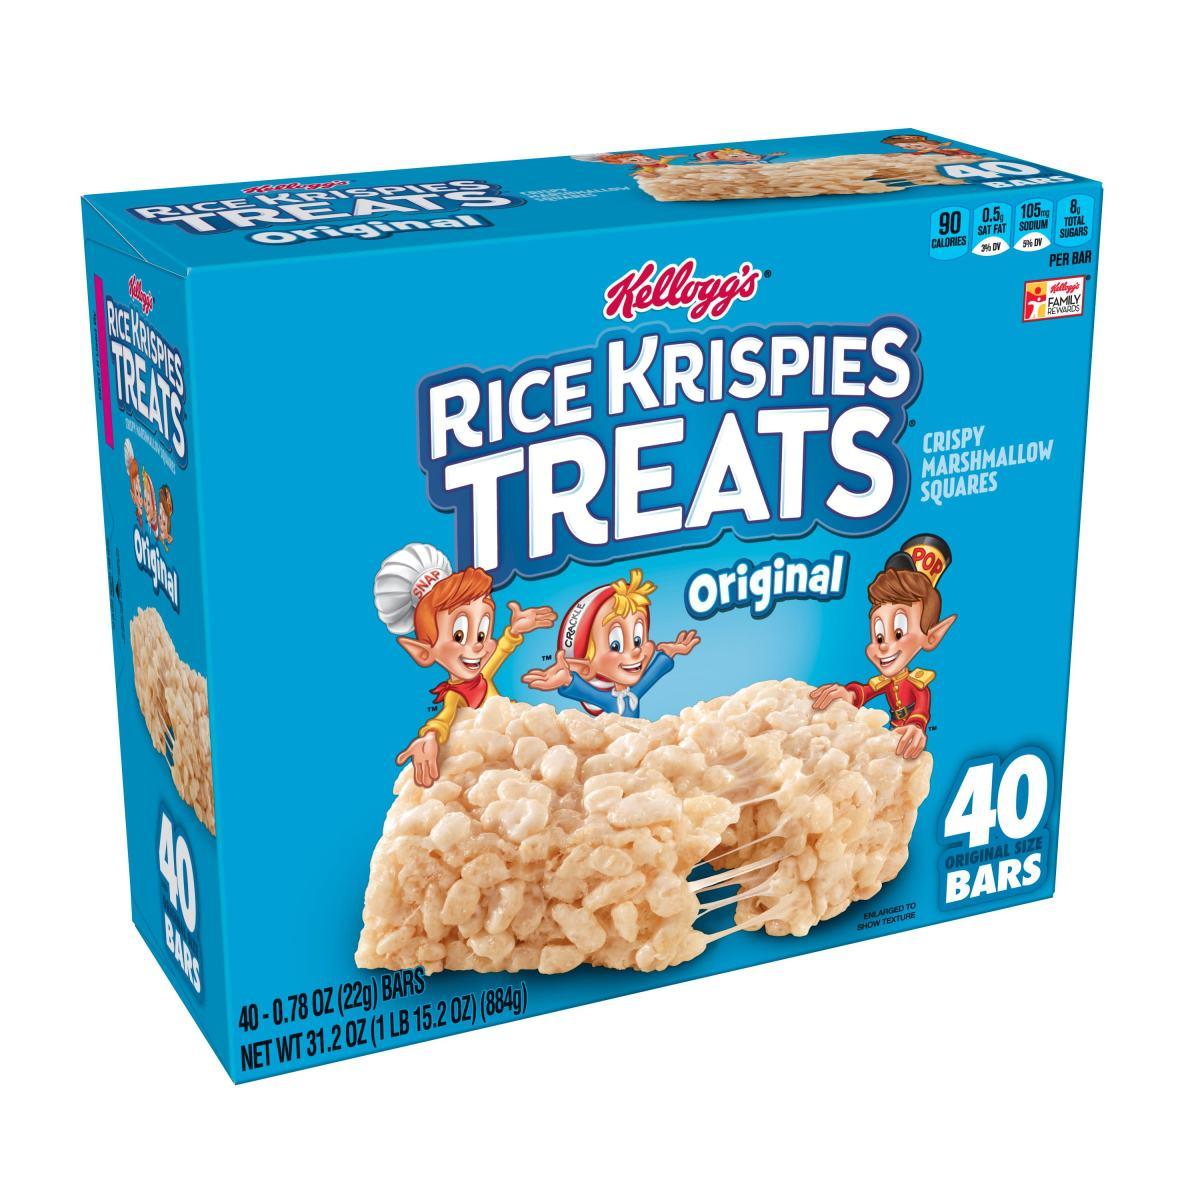 Rice Krispies Treats - Is This Kosher?